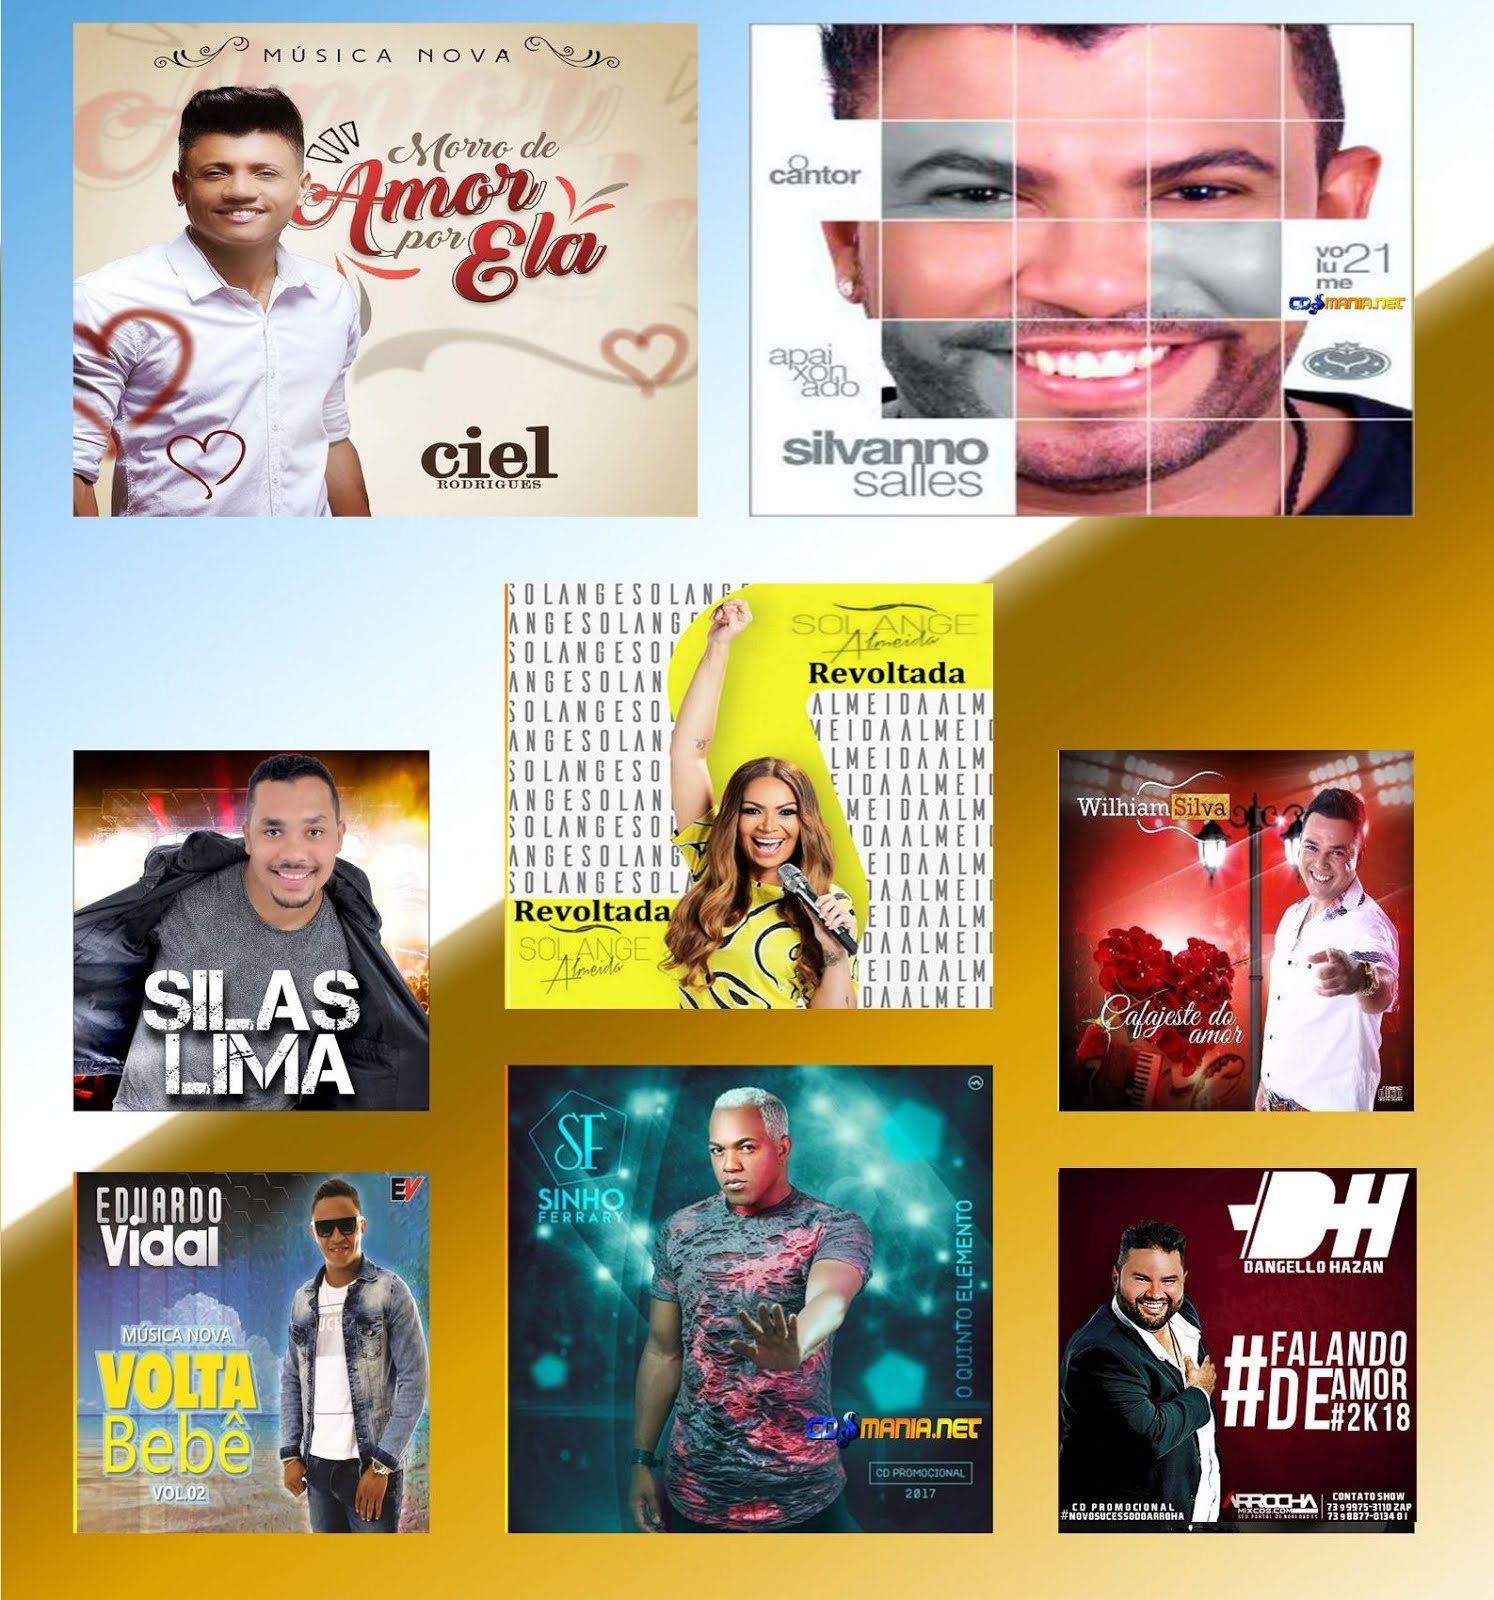 CD MP3 10-2017